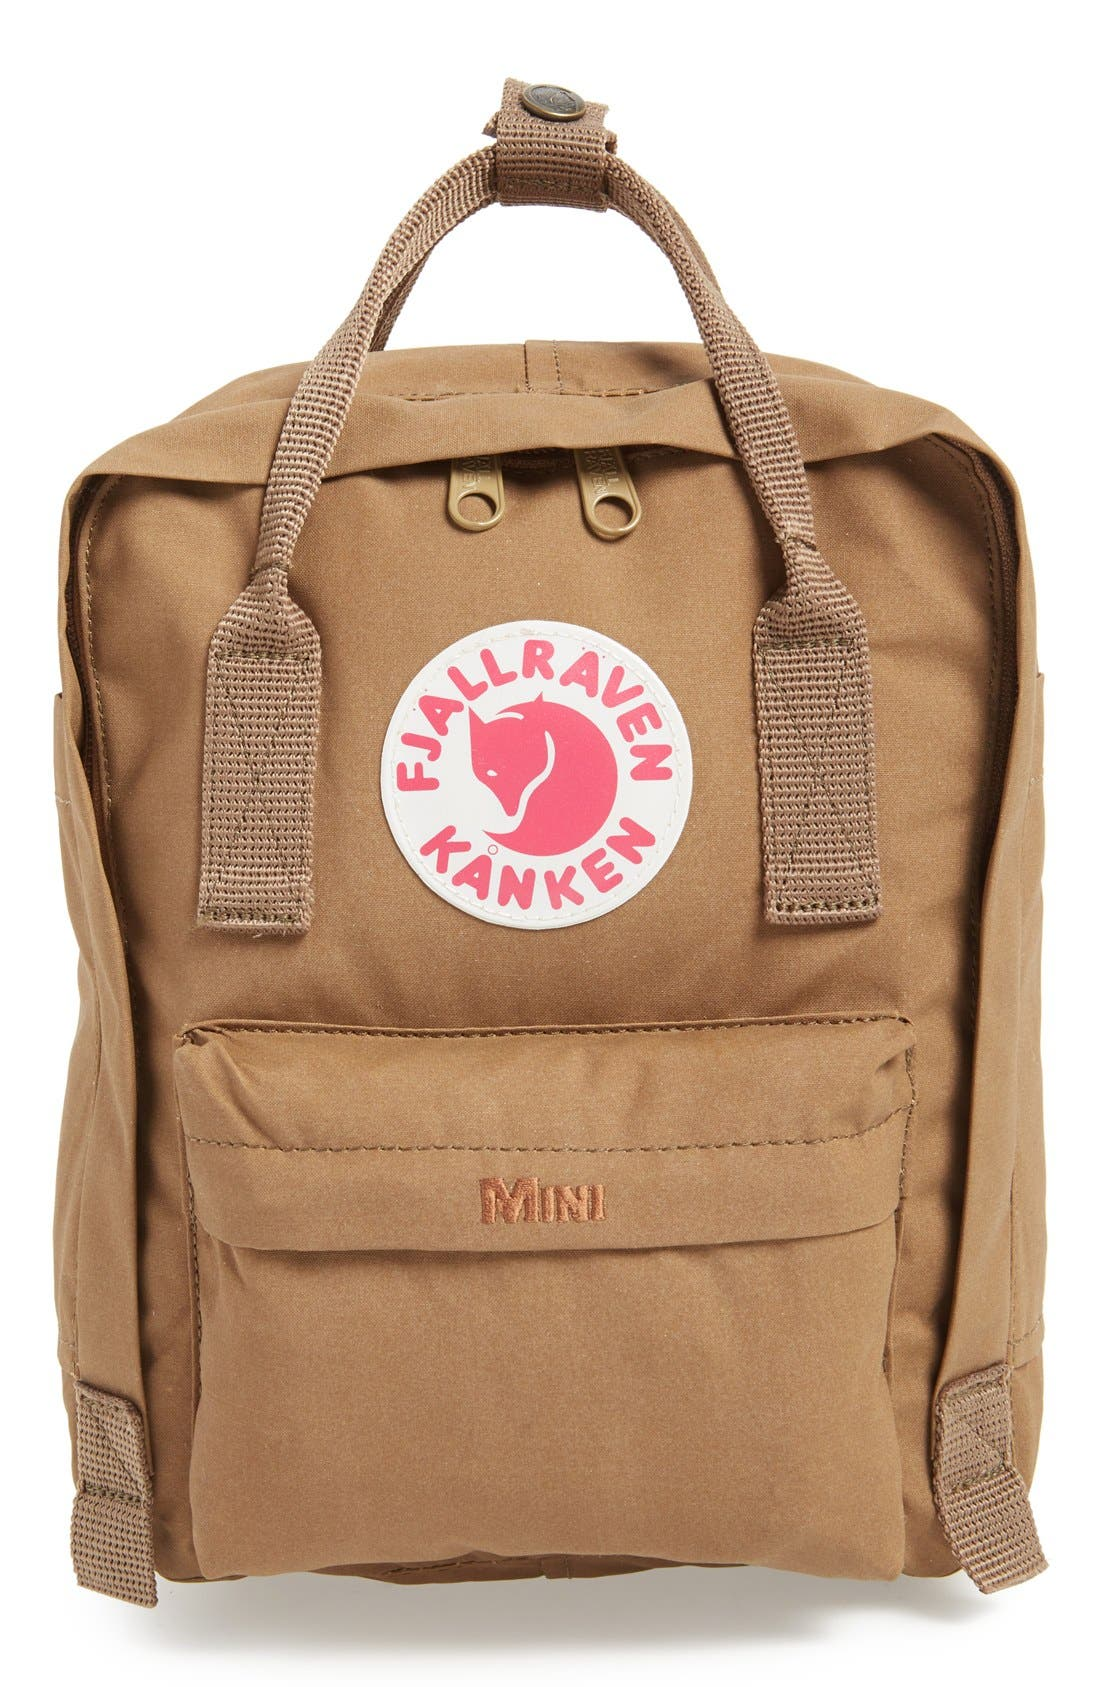 Main Image - Fjällräven 'Mini Kånken' Water Resistant Backpack